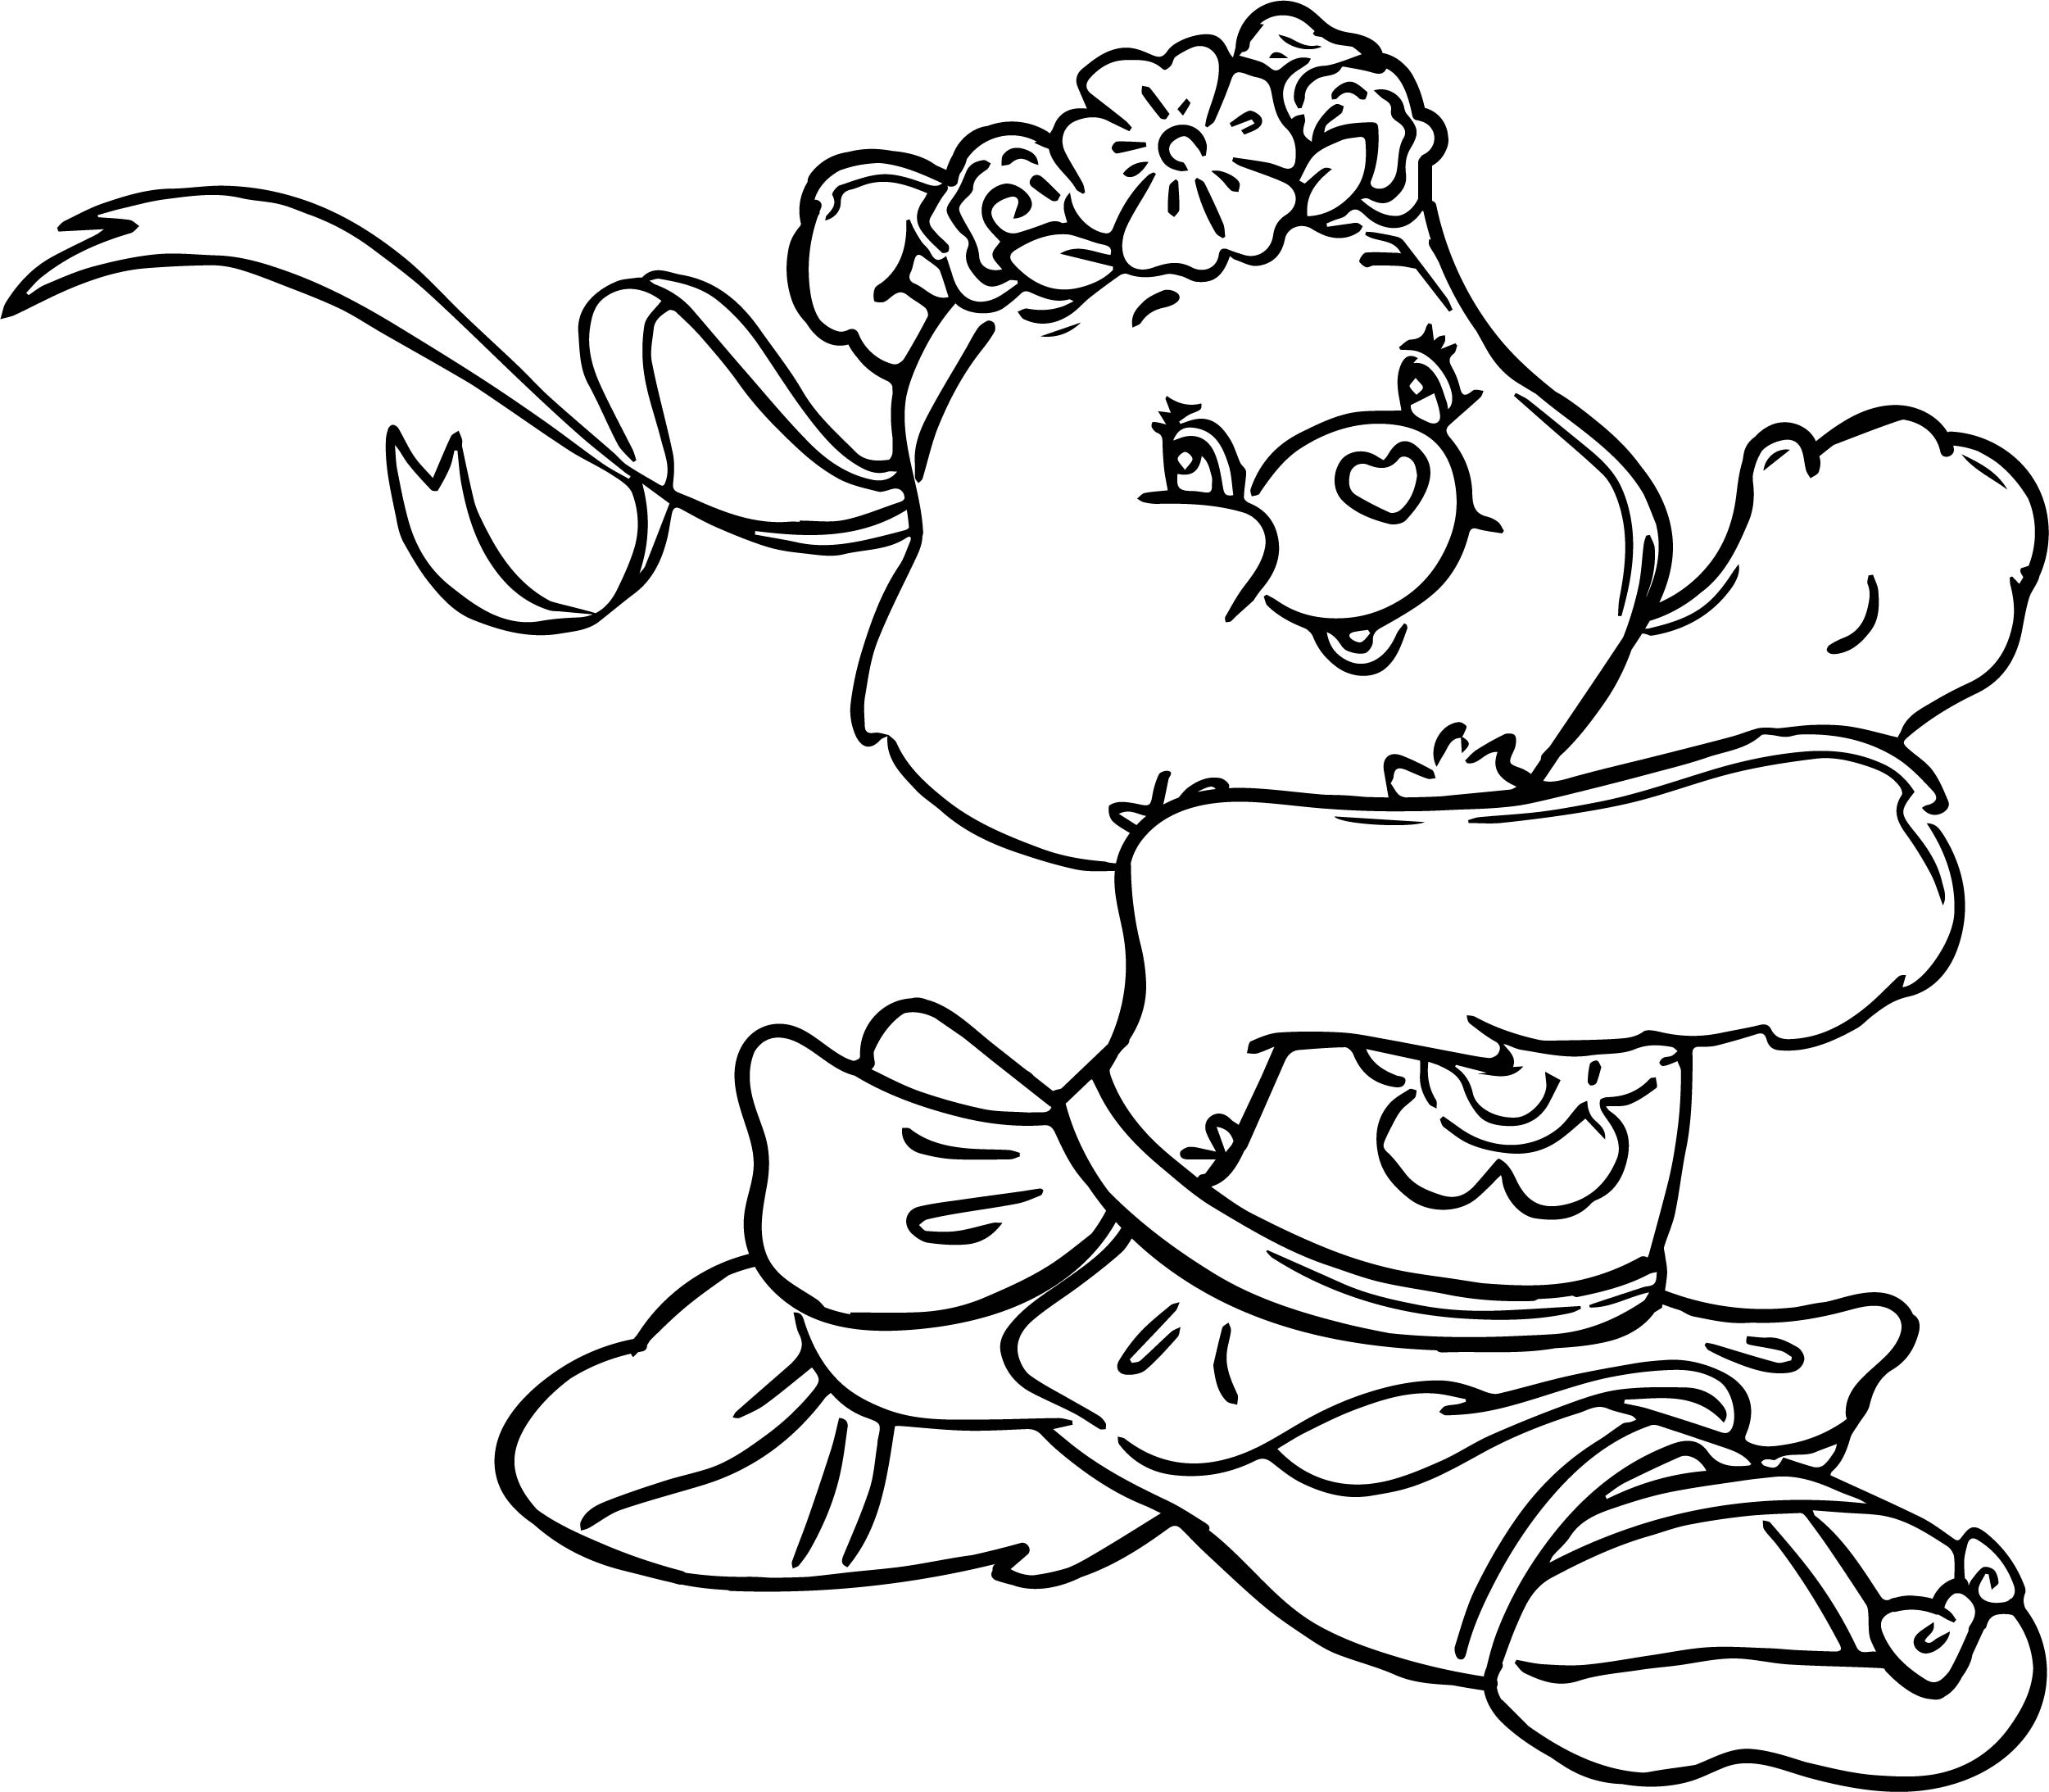 Bear Ballerina Coloring Page